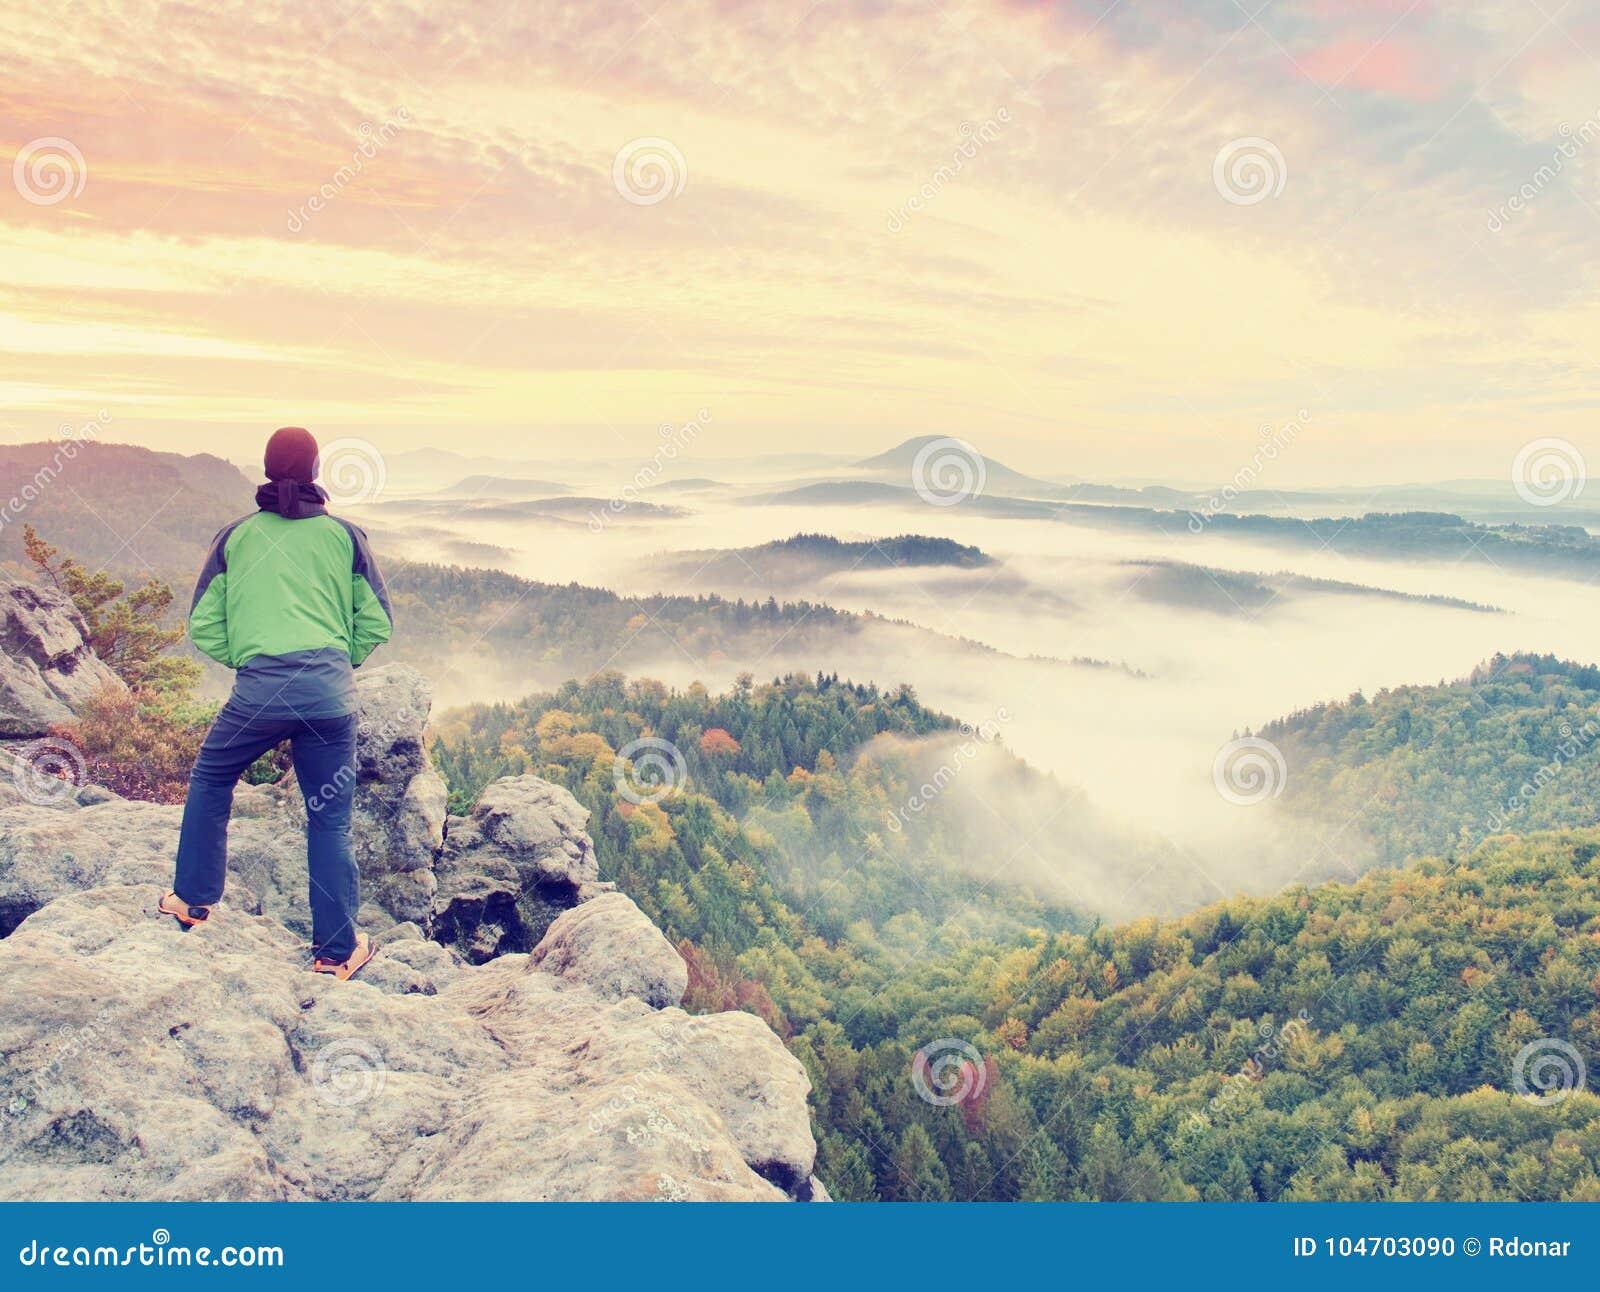 Man stay on rocky peak within daybreak and watch over misty landscape.